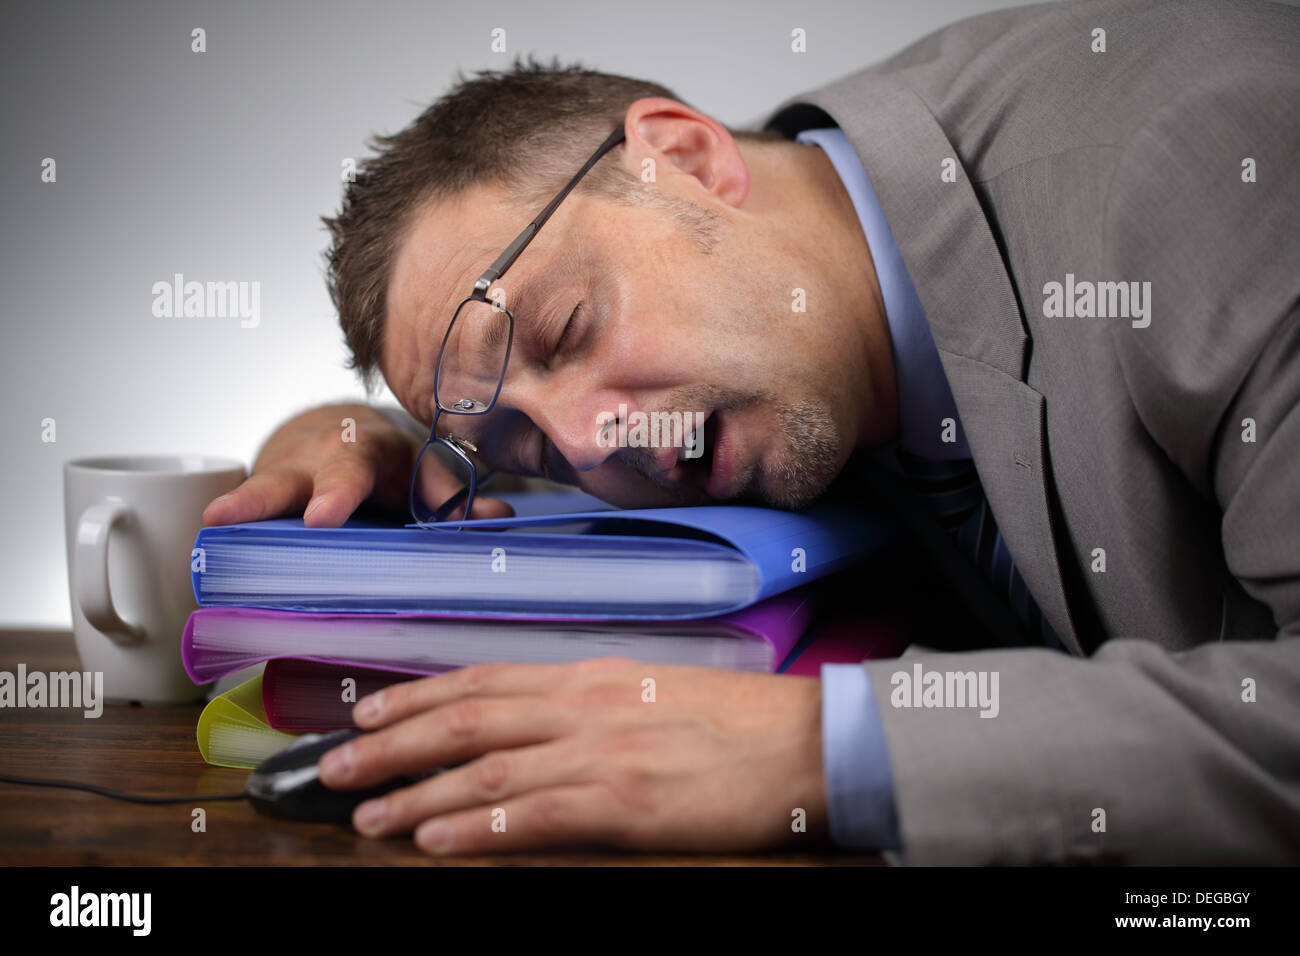 Schlafen am Arbeitsplatz Stockbild